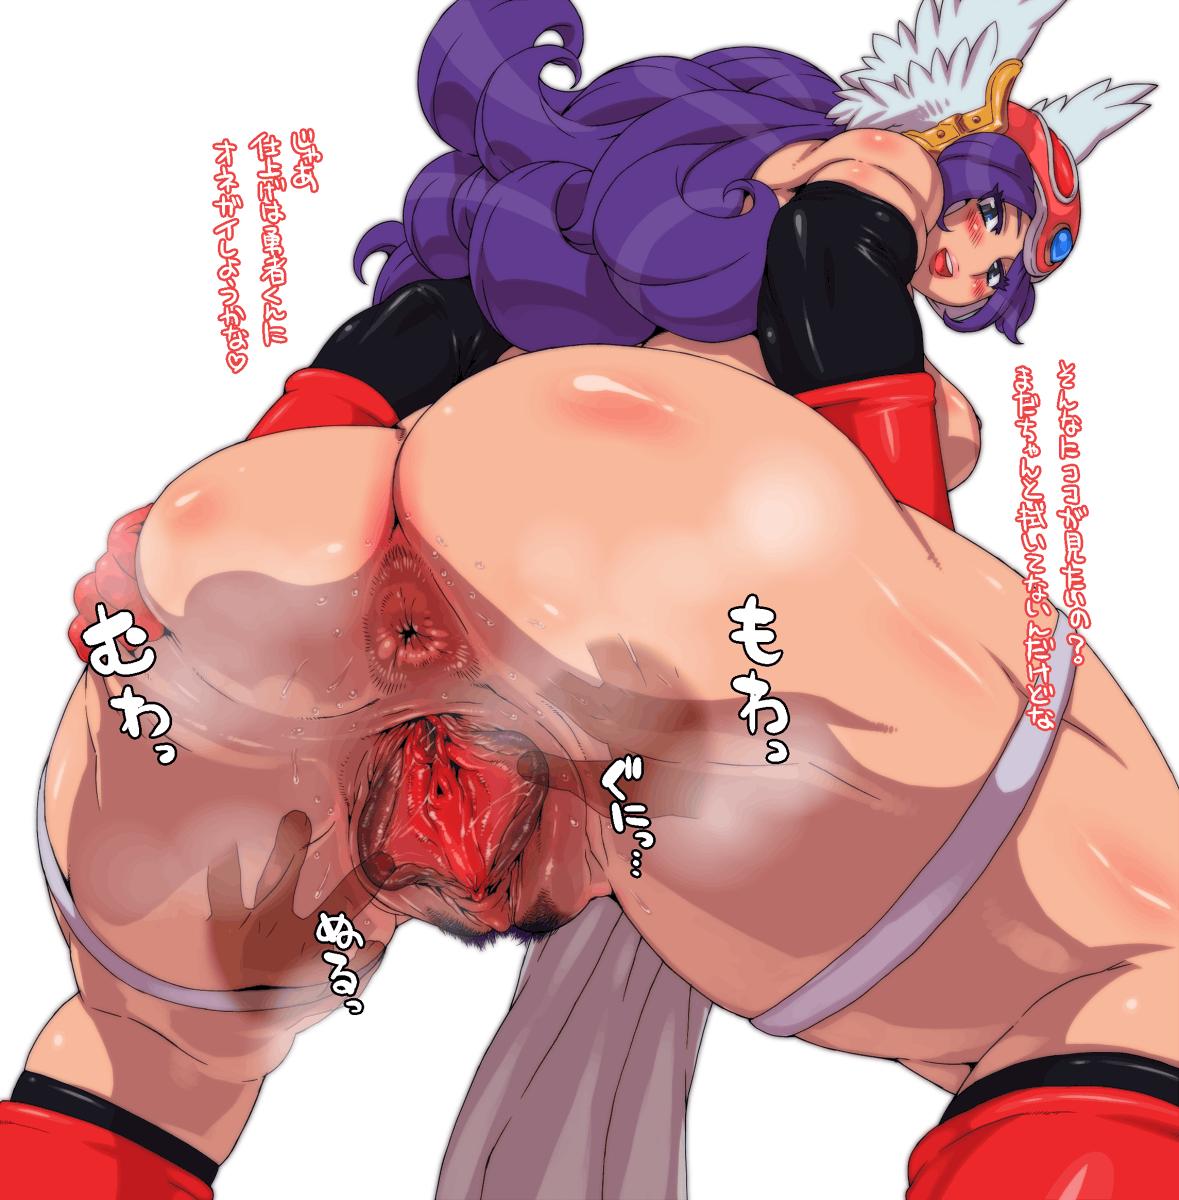 Naked anime dragon pussy sex tube